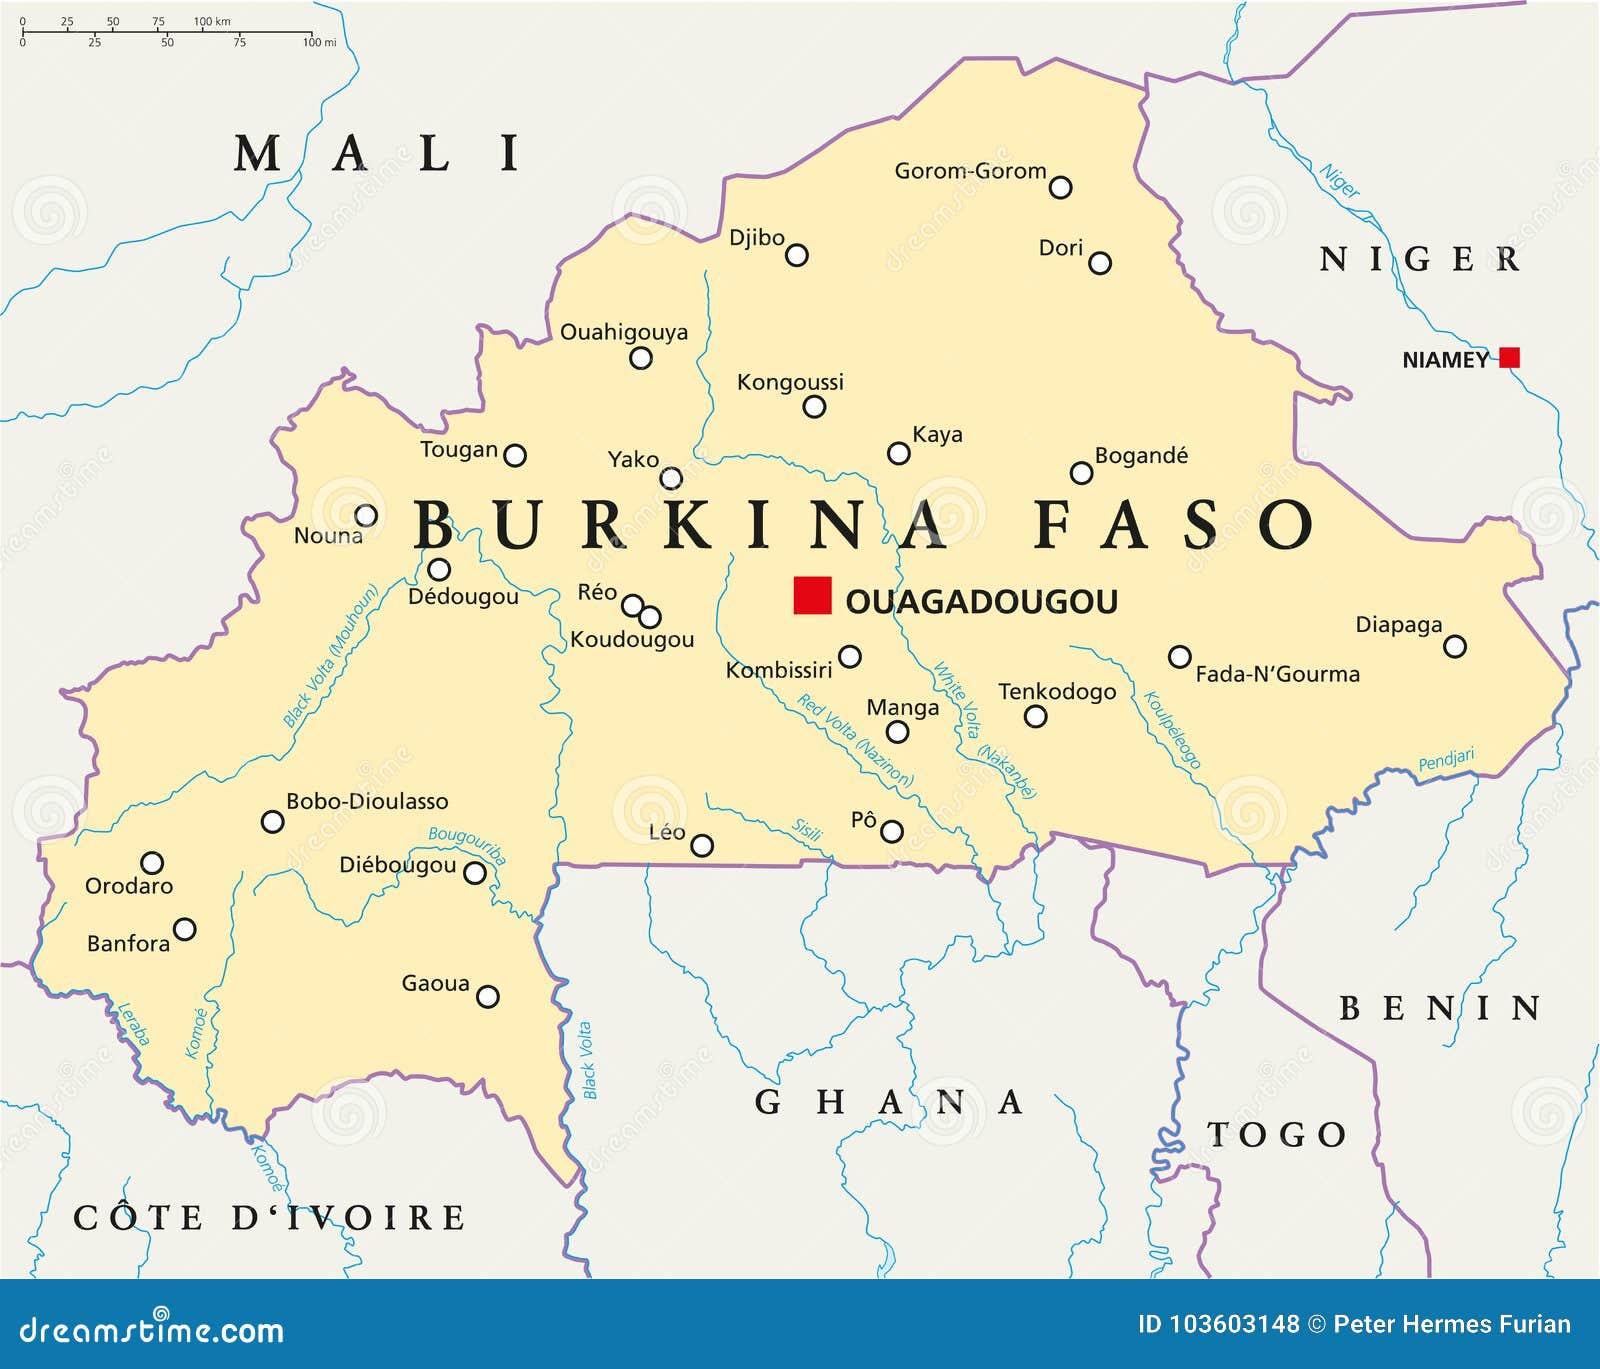 Burkina Faso Map Burkina Faso Political Map stock vector. Illustration of  Burkina Faso Map